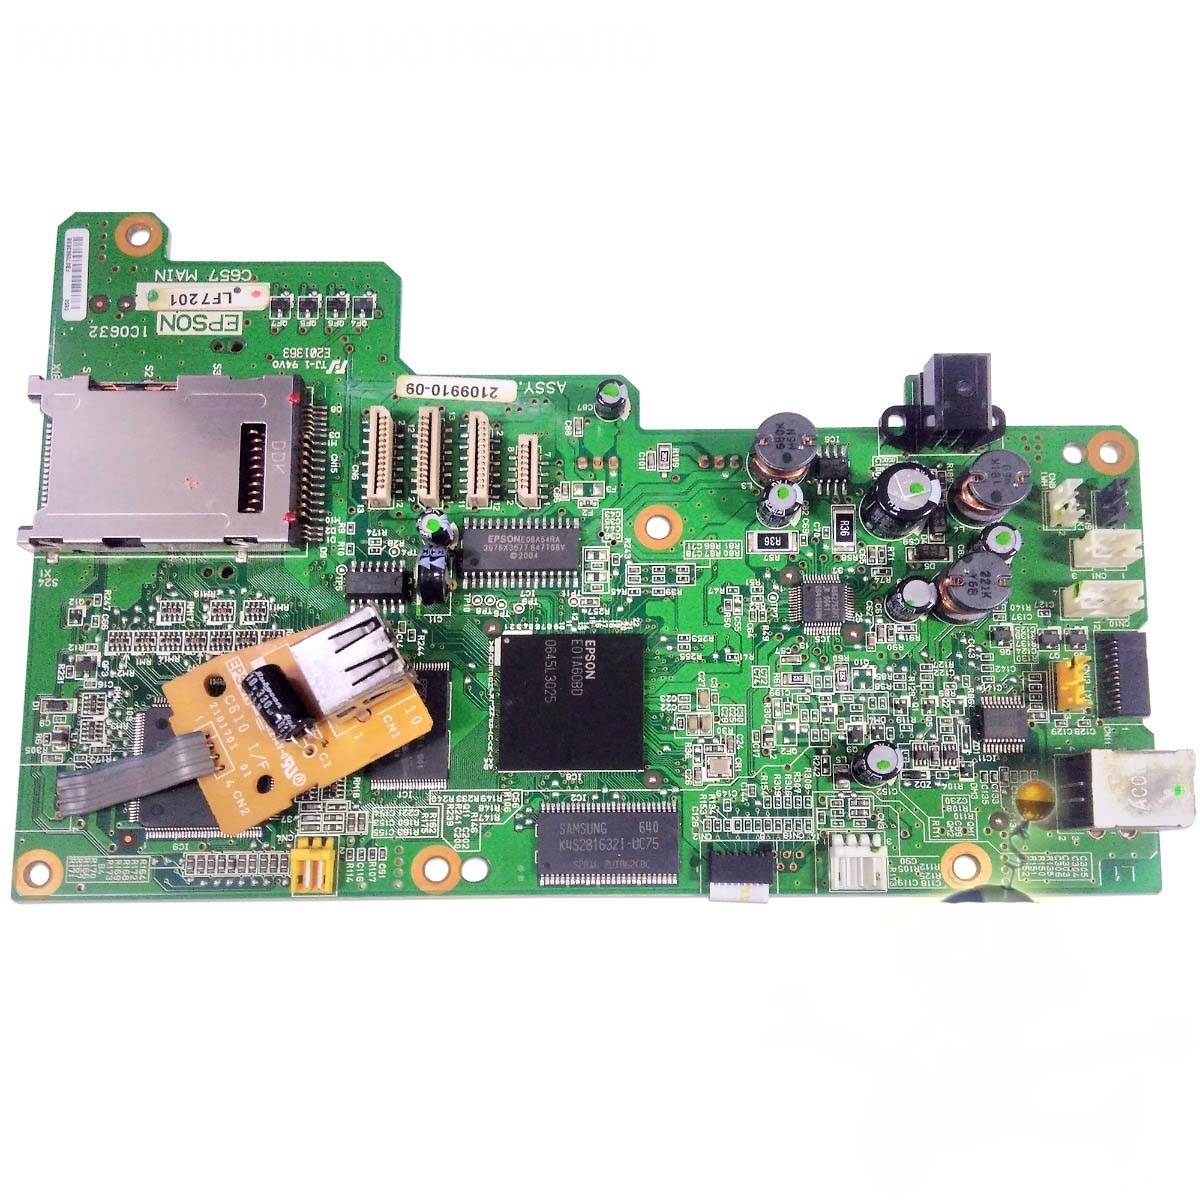 Placa Lógica Multifuncional Epson Stylus Cx4100 PN:e01a60bd - Retirado